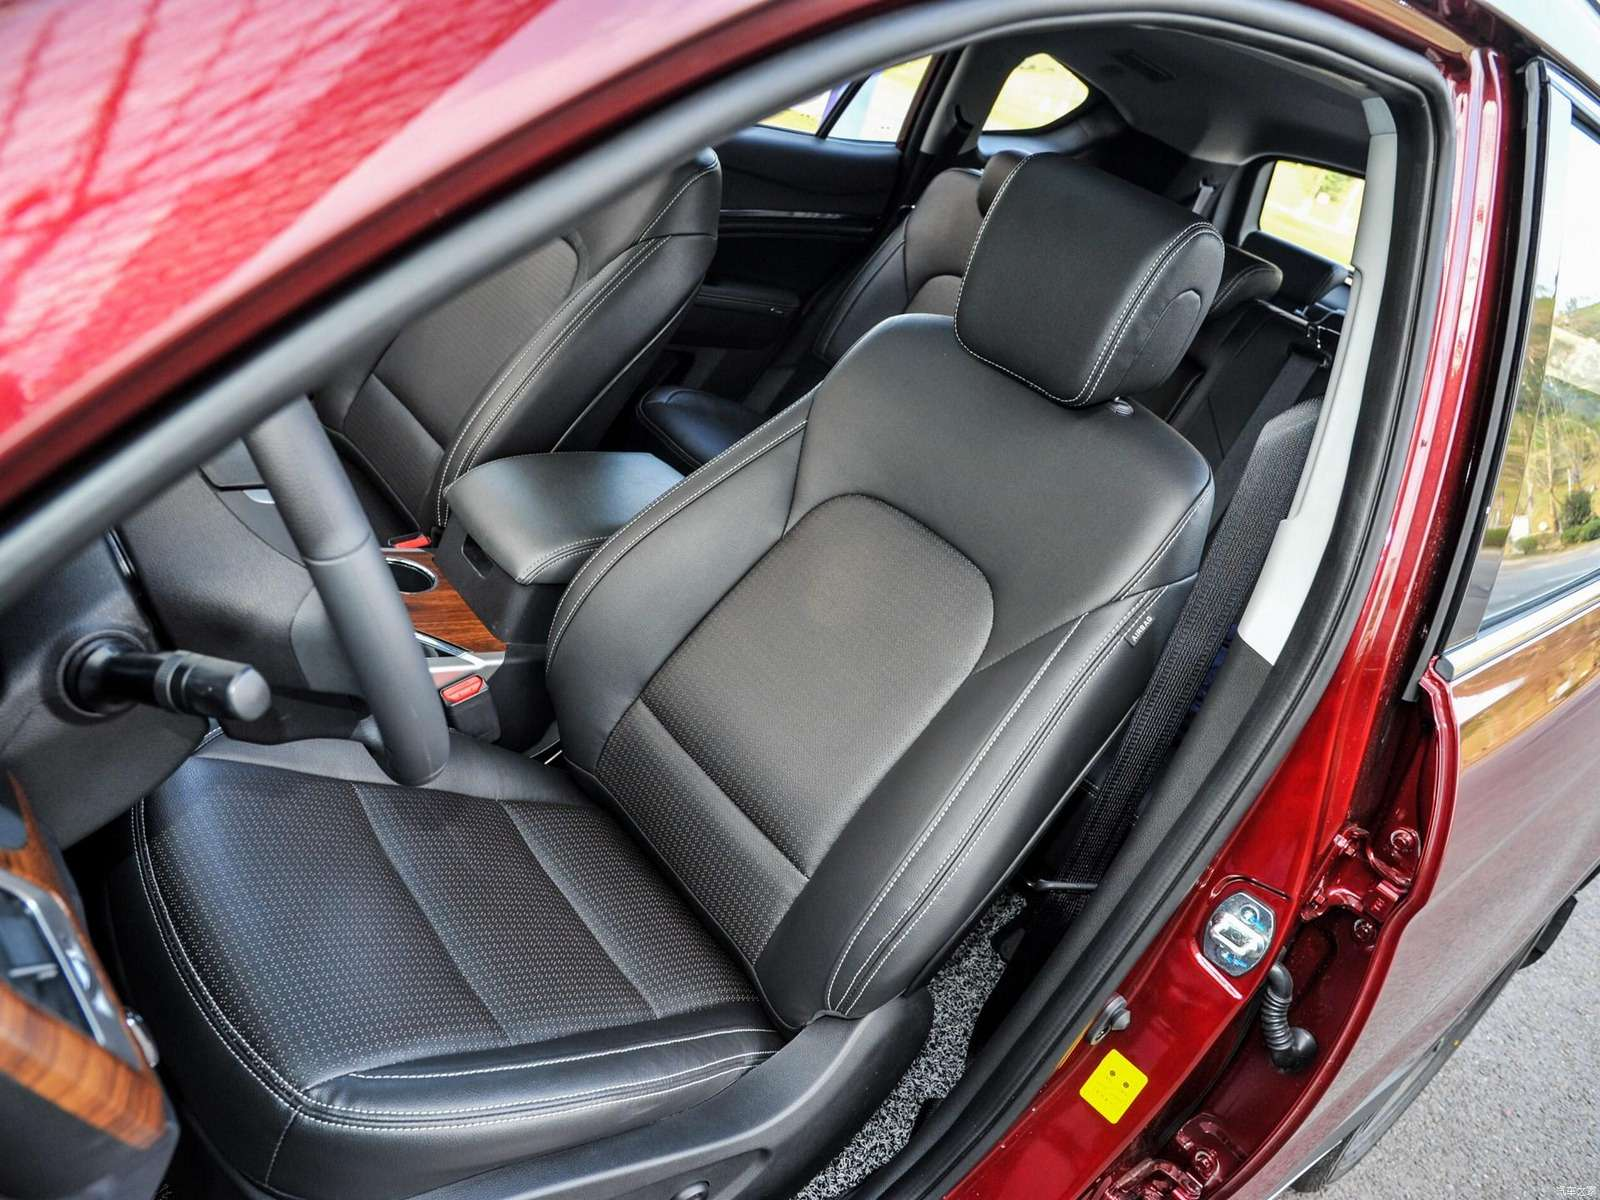 Шокирующая дешевизна: Lifan X80 поступил впродажу— фото 728923